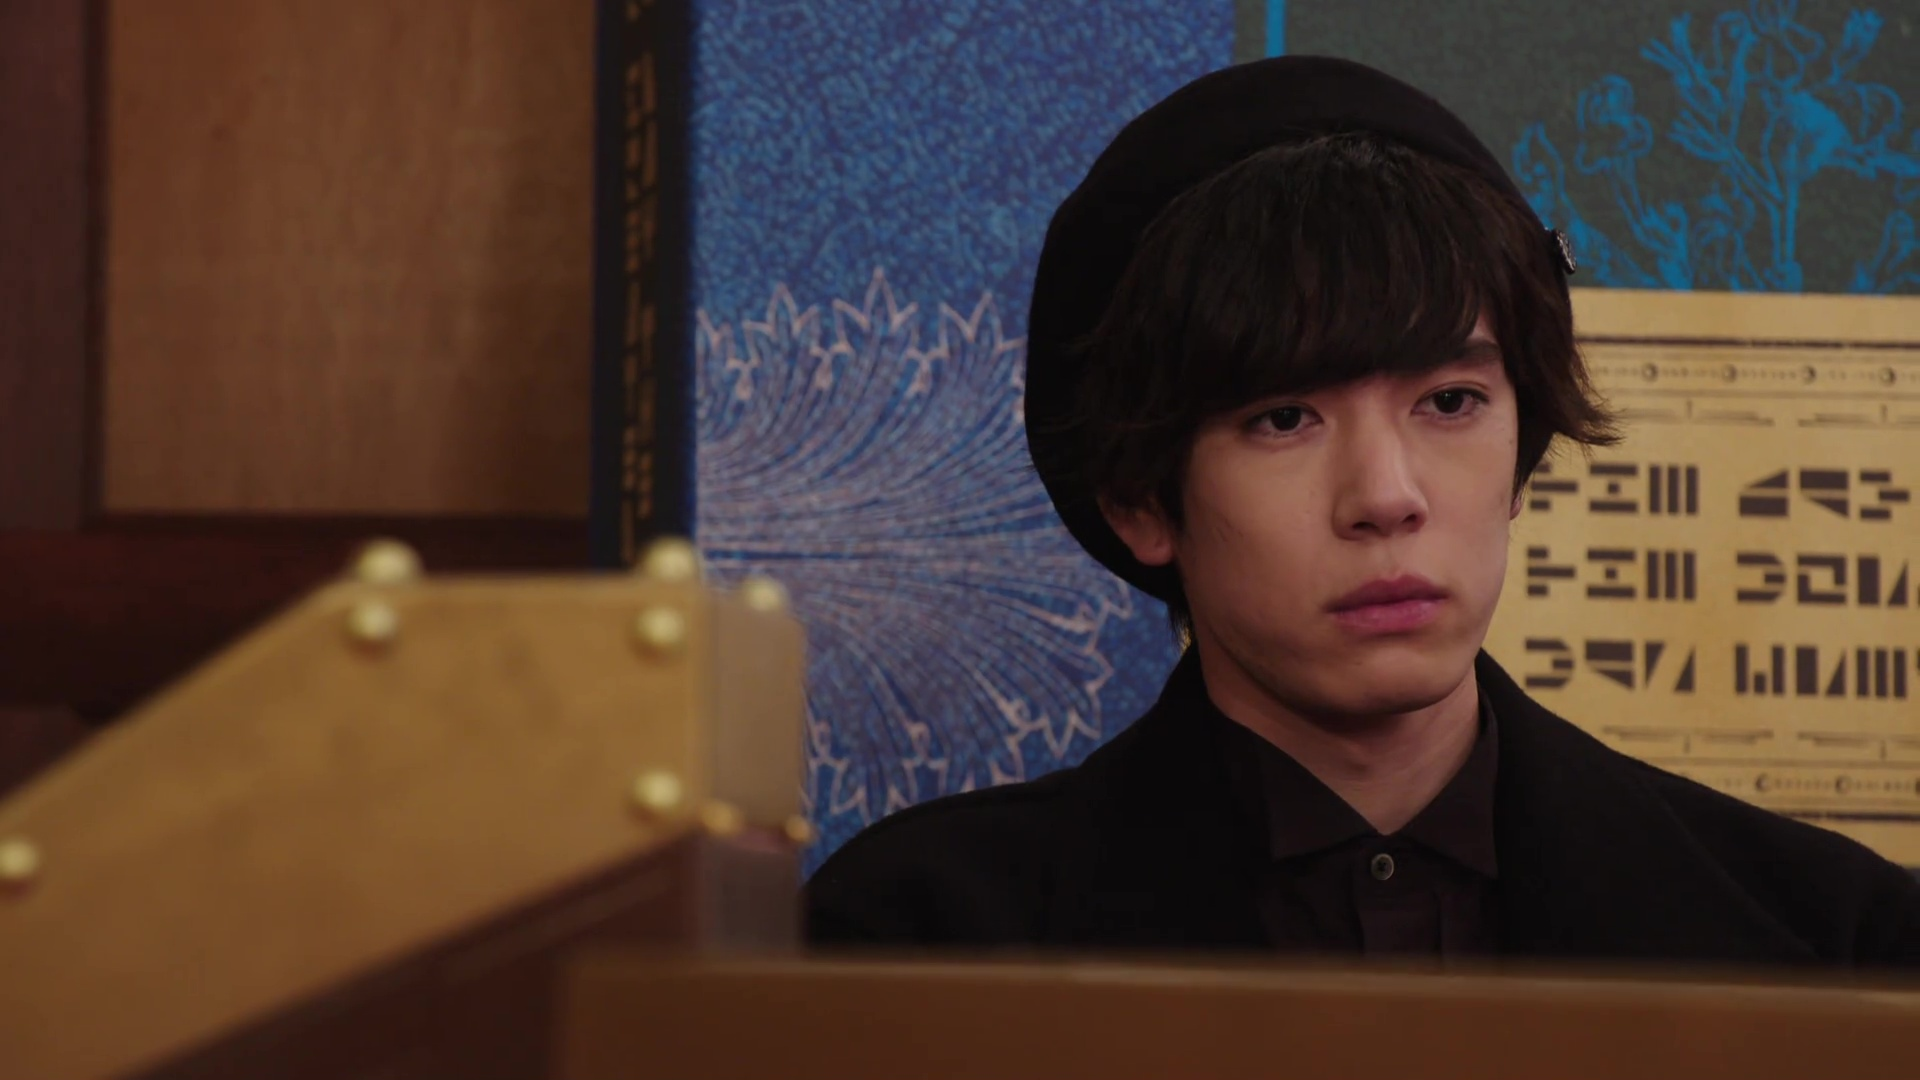 Kamen Rider Saber Episode 24 Recap